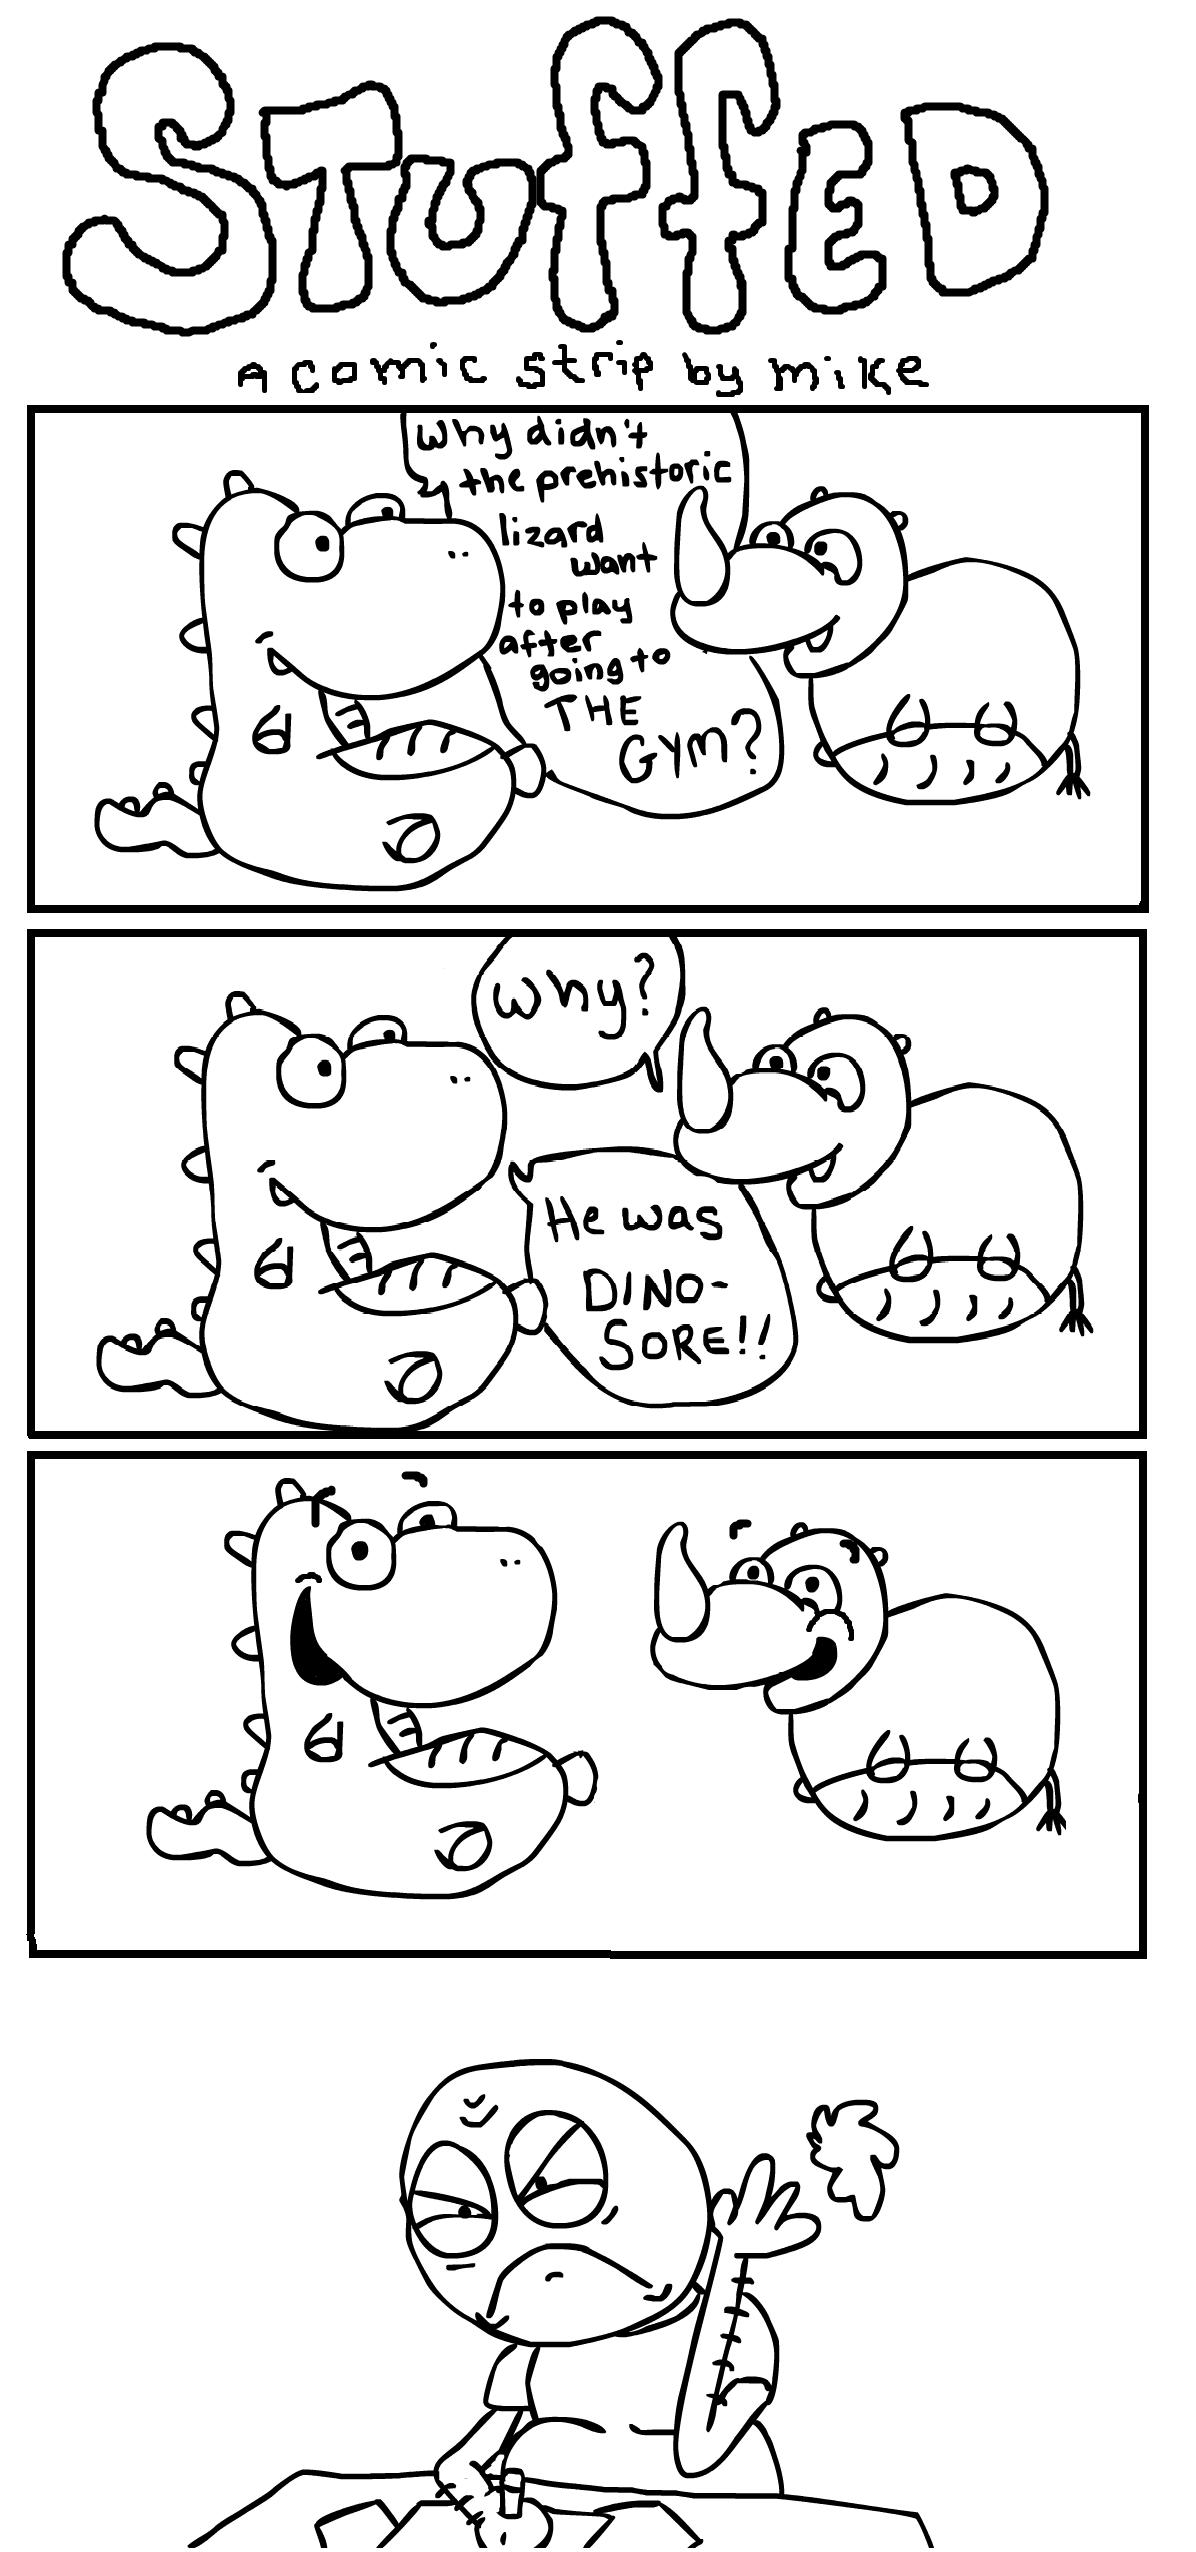 STUFFED - a comic strip